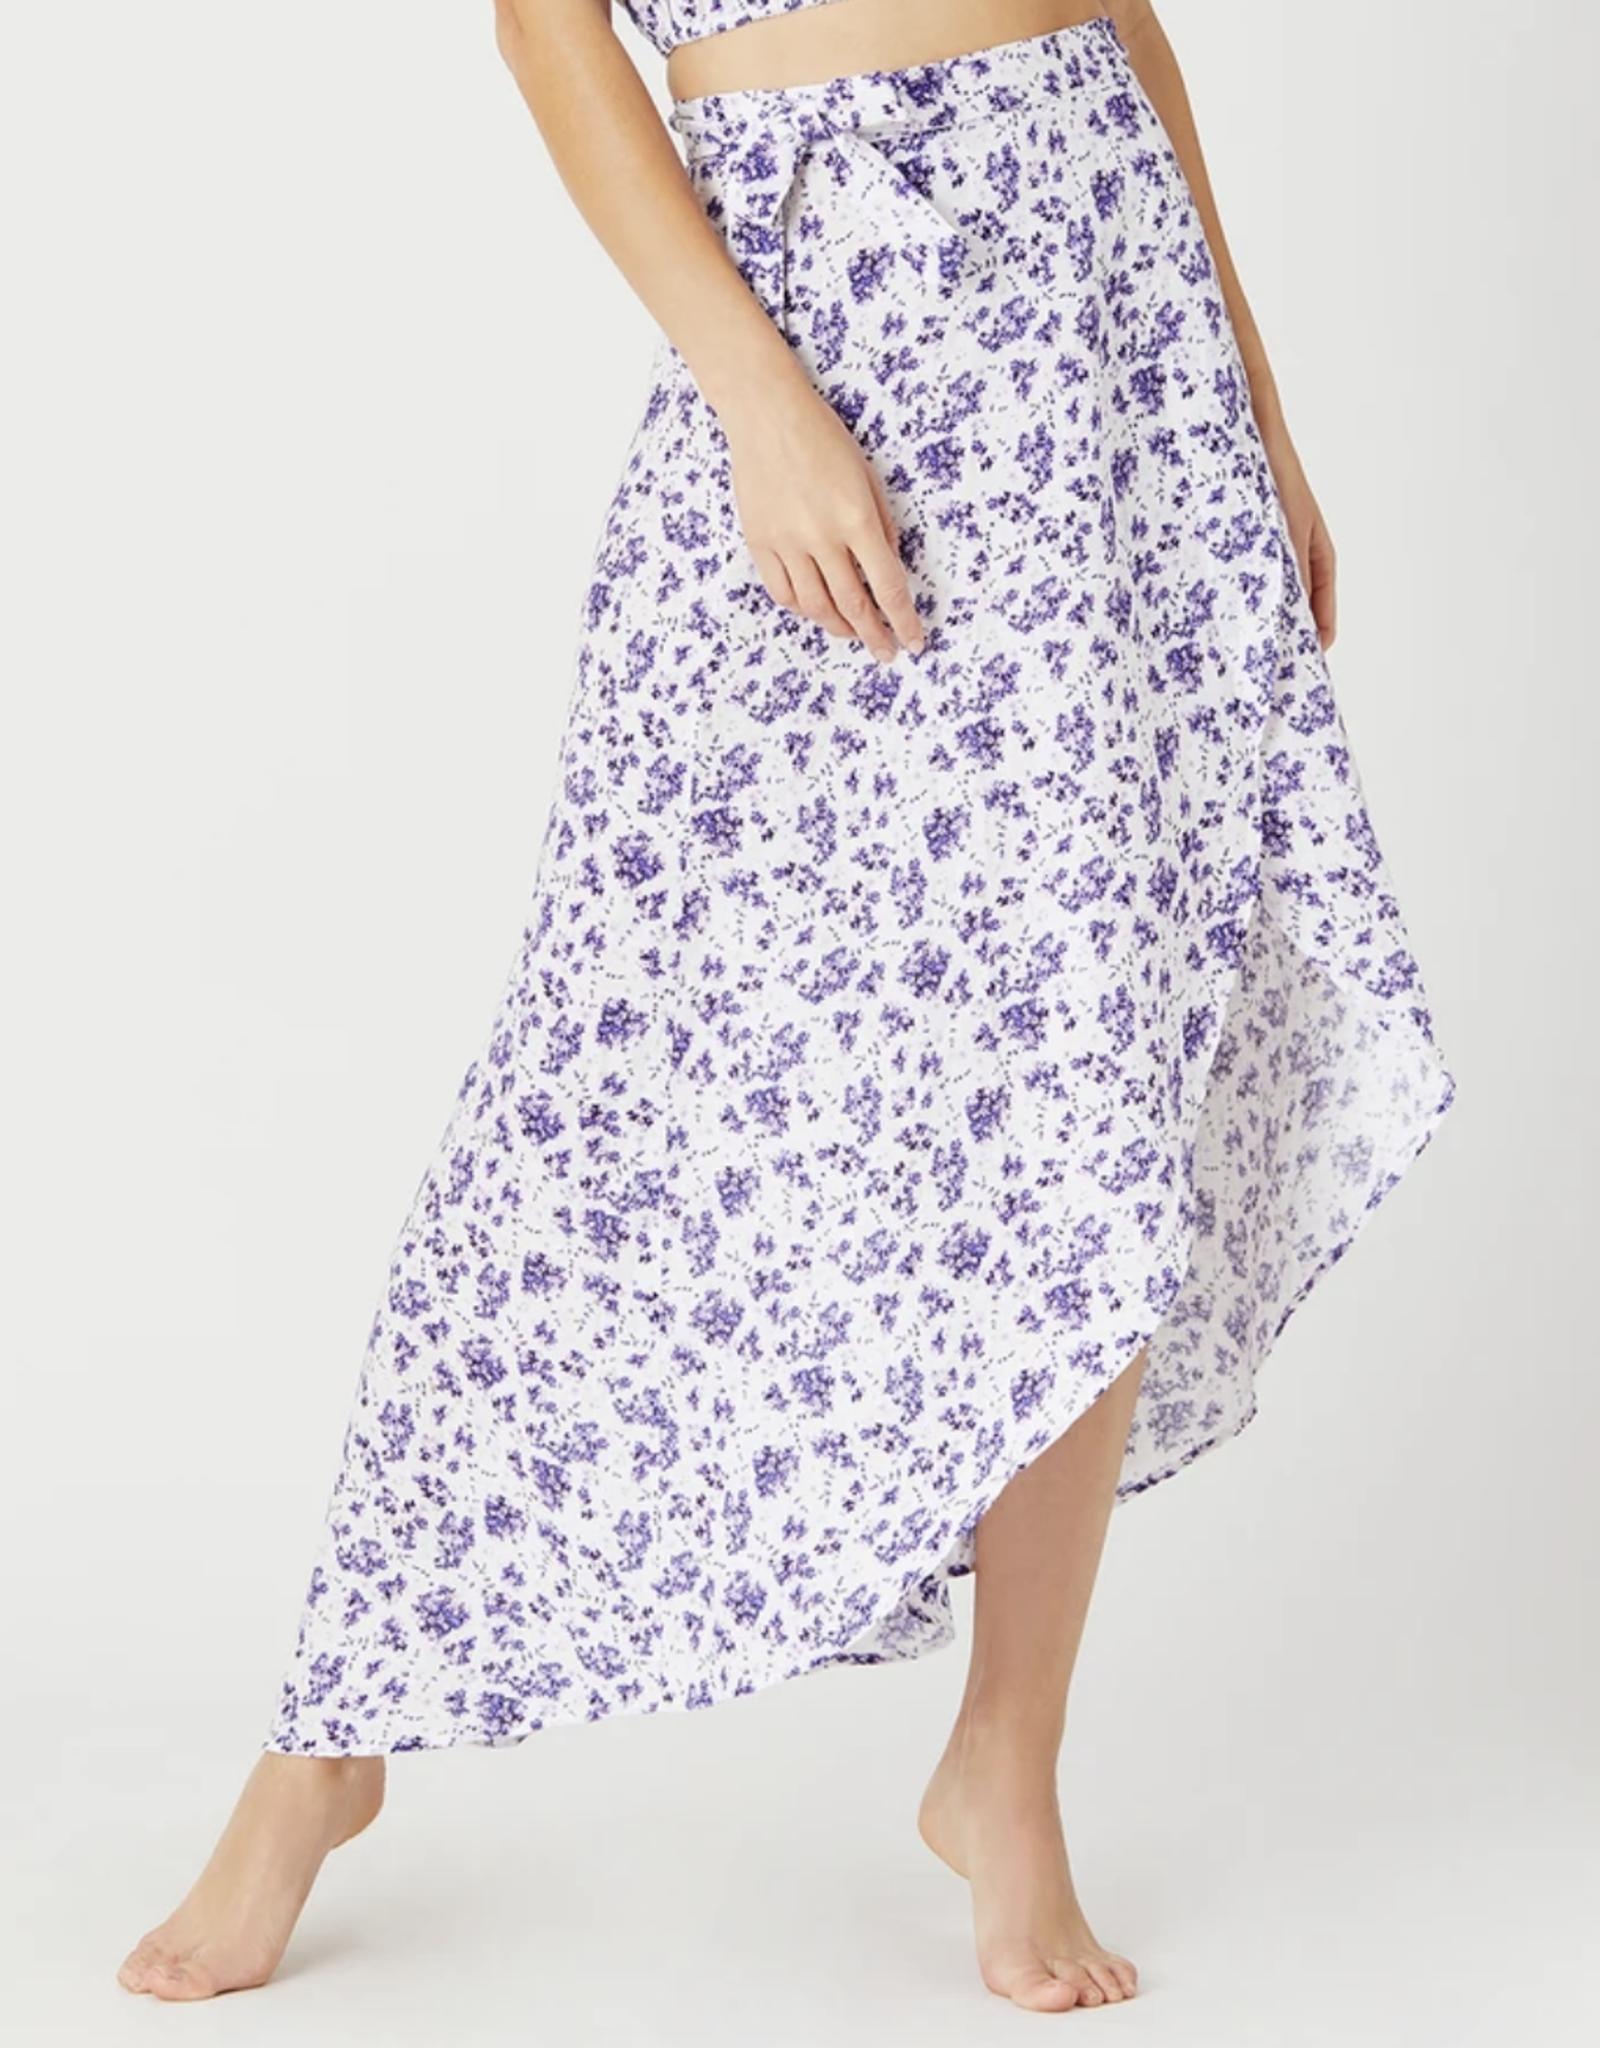 Onia Lavender White Amanda Wrap Skirt